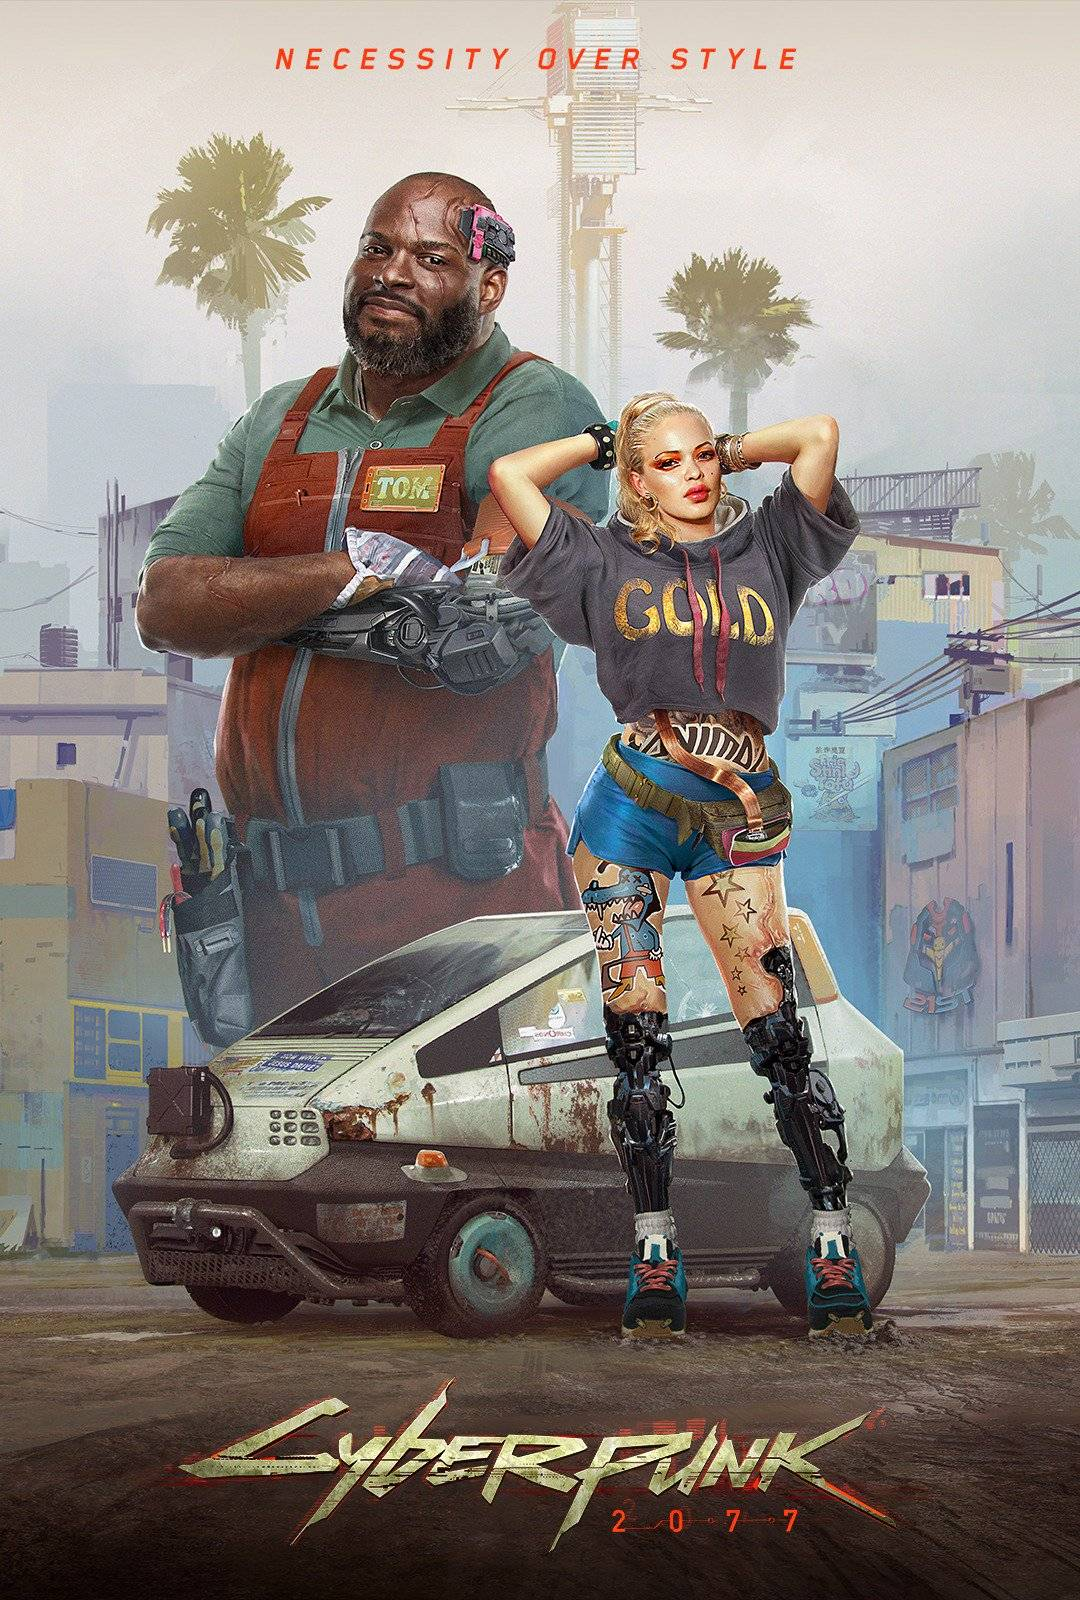 Стили Cyberpunk 2077 в одежде и архитектуре 1